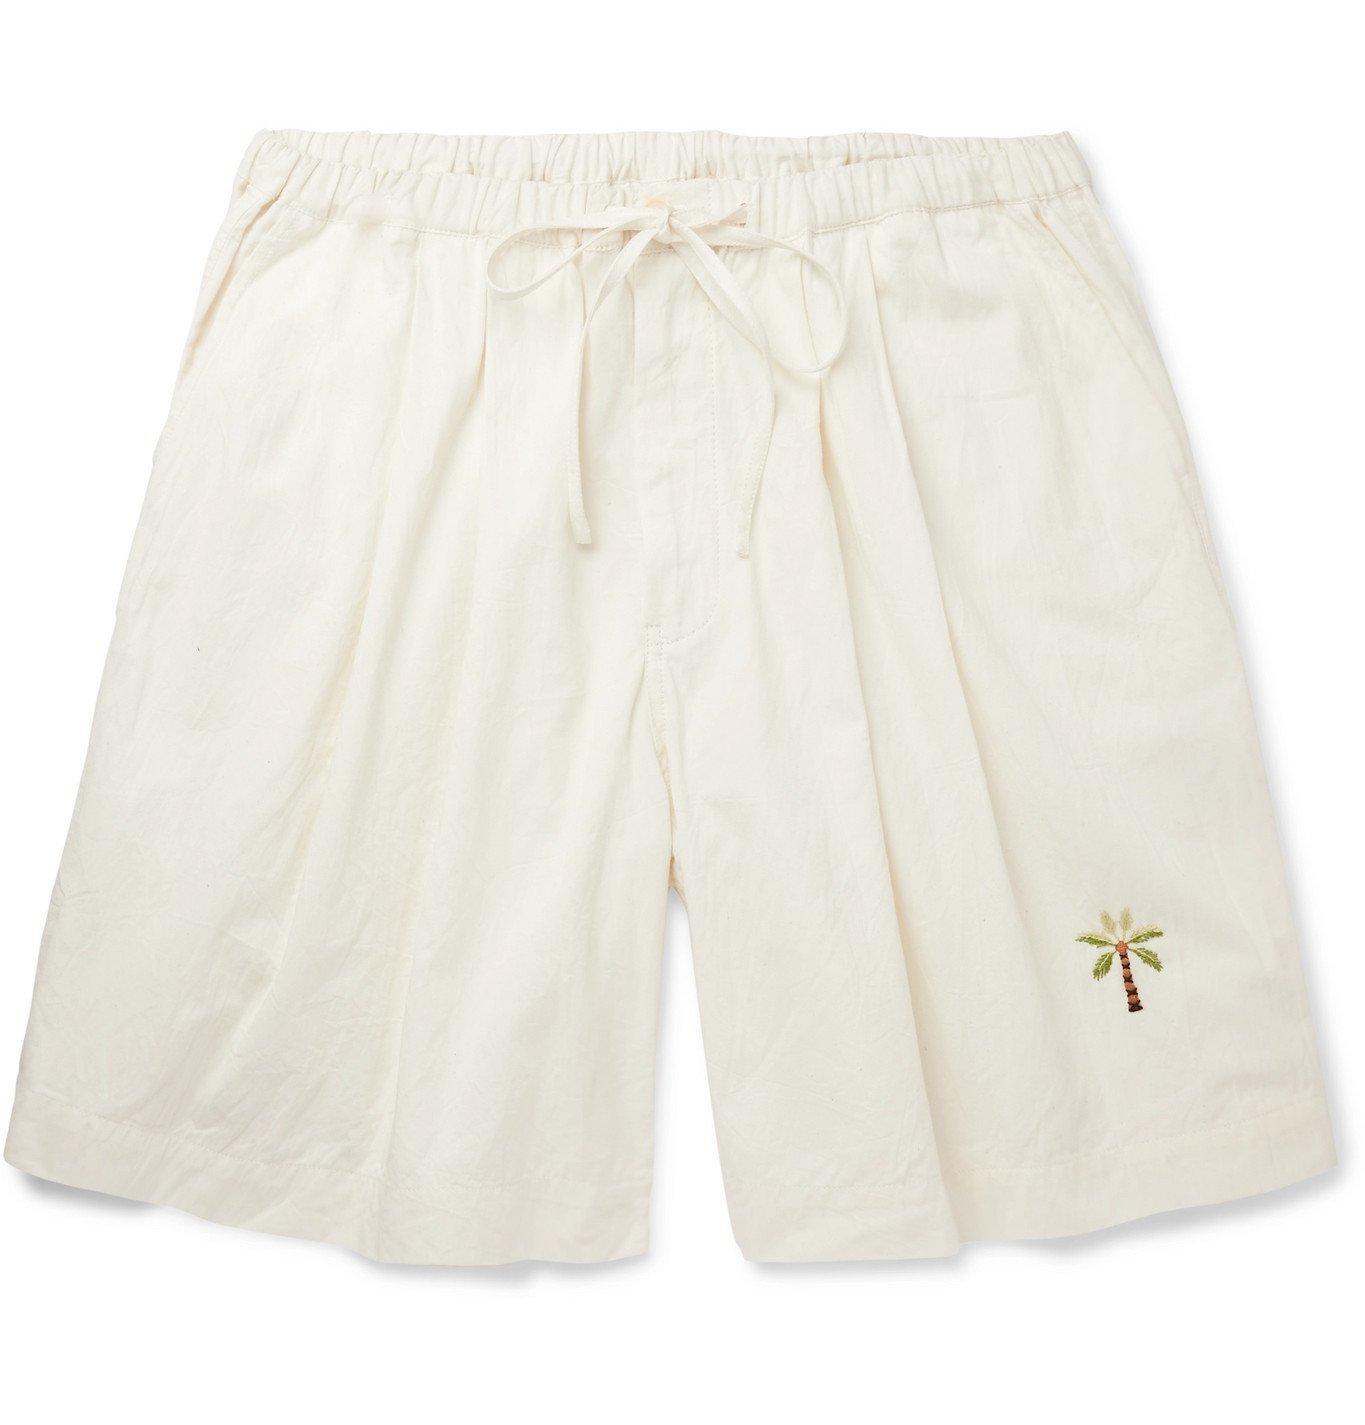 Photo: Story Mfg. - Wide-Leg Embroidered Organic Cotton Drawstring Shorts - Neutrals